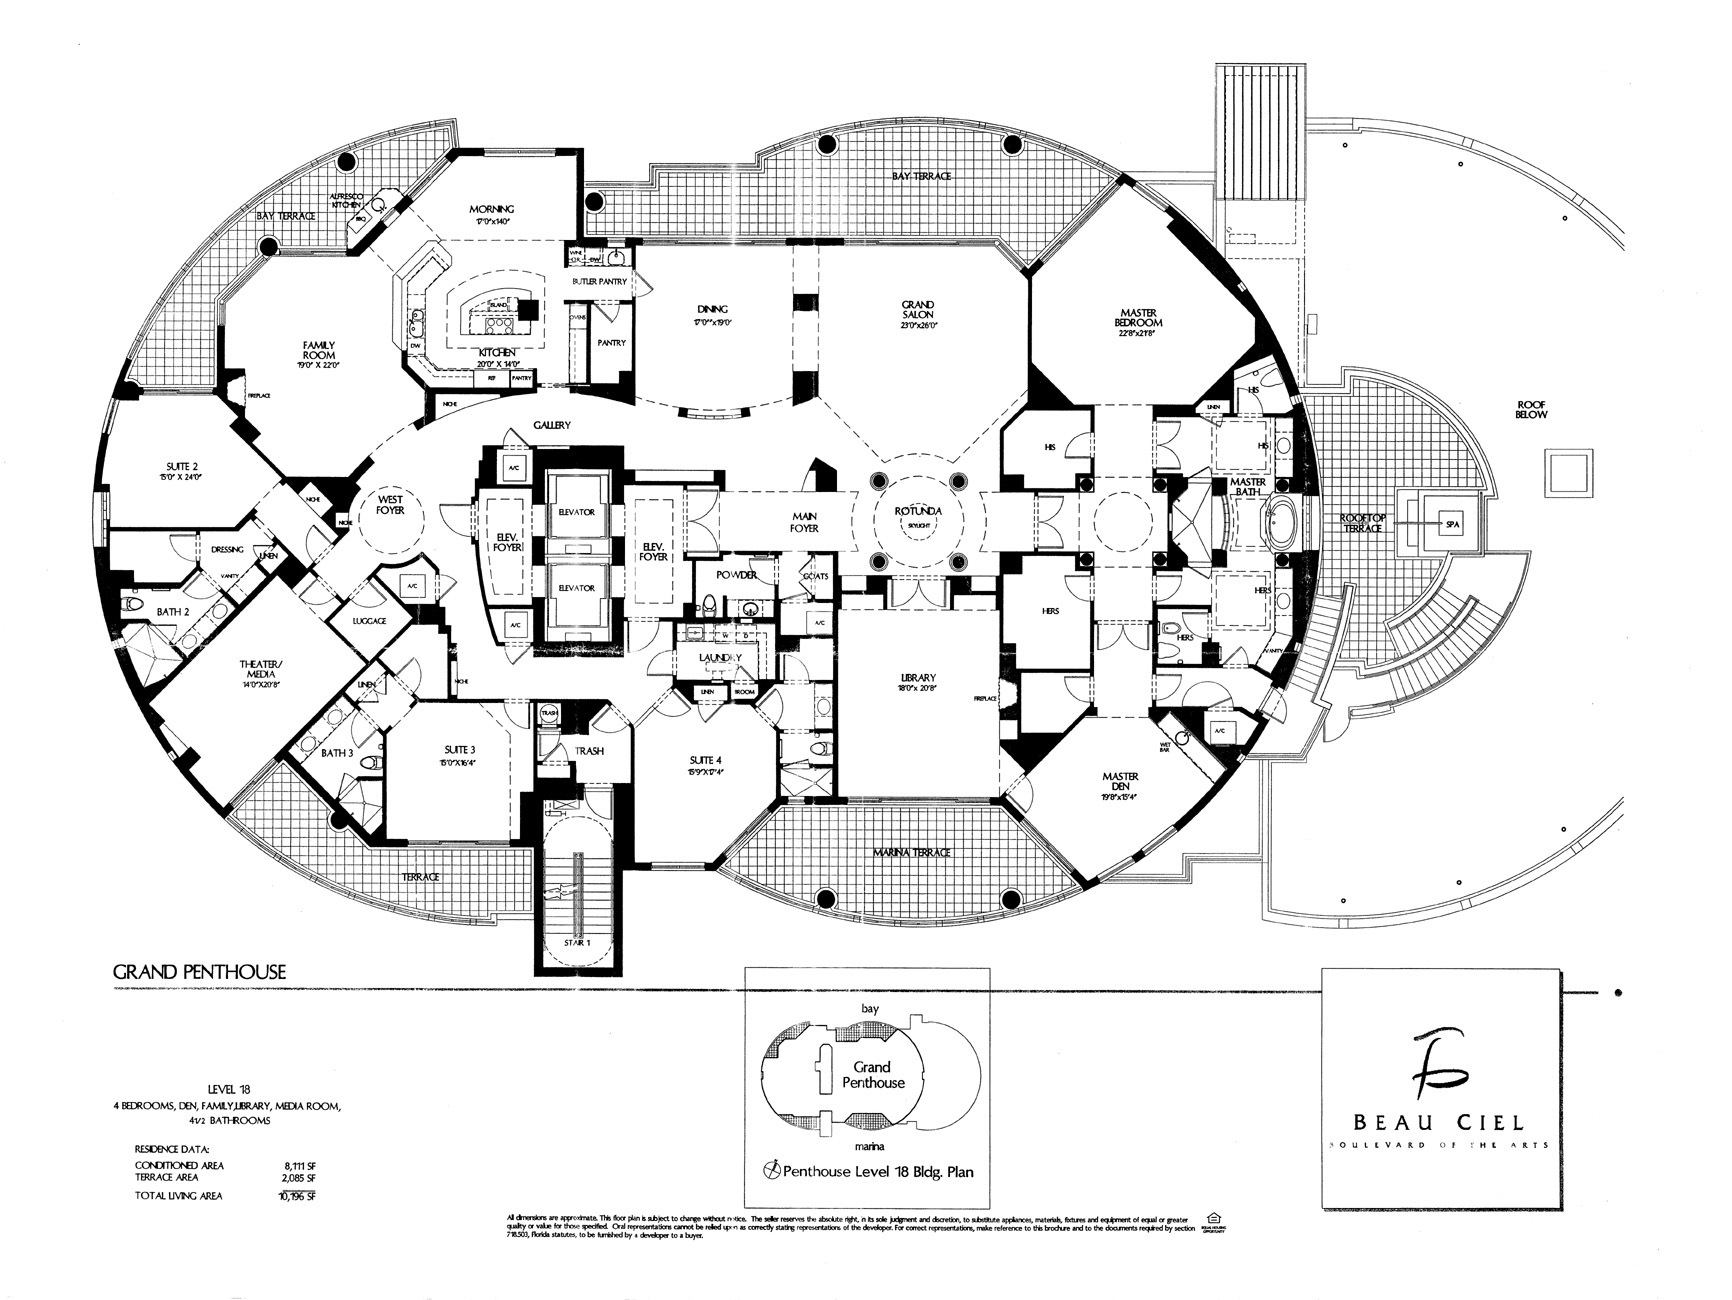 Beau Ciel Floor Plans